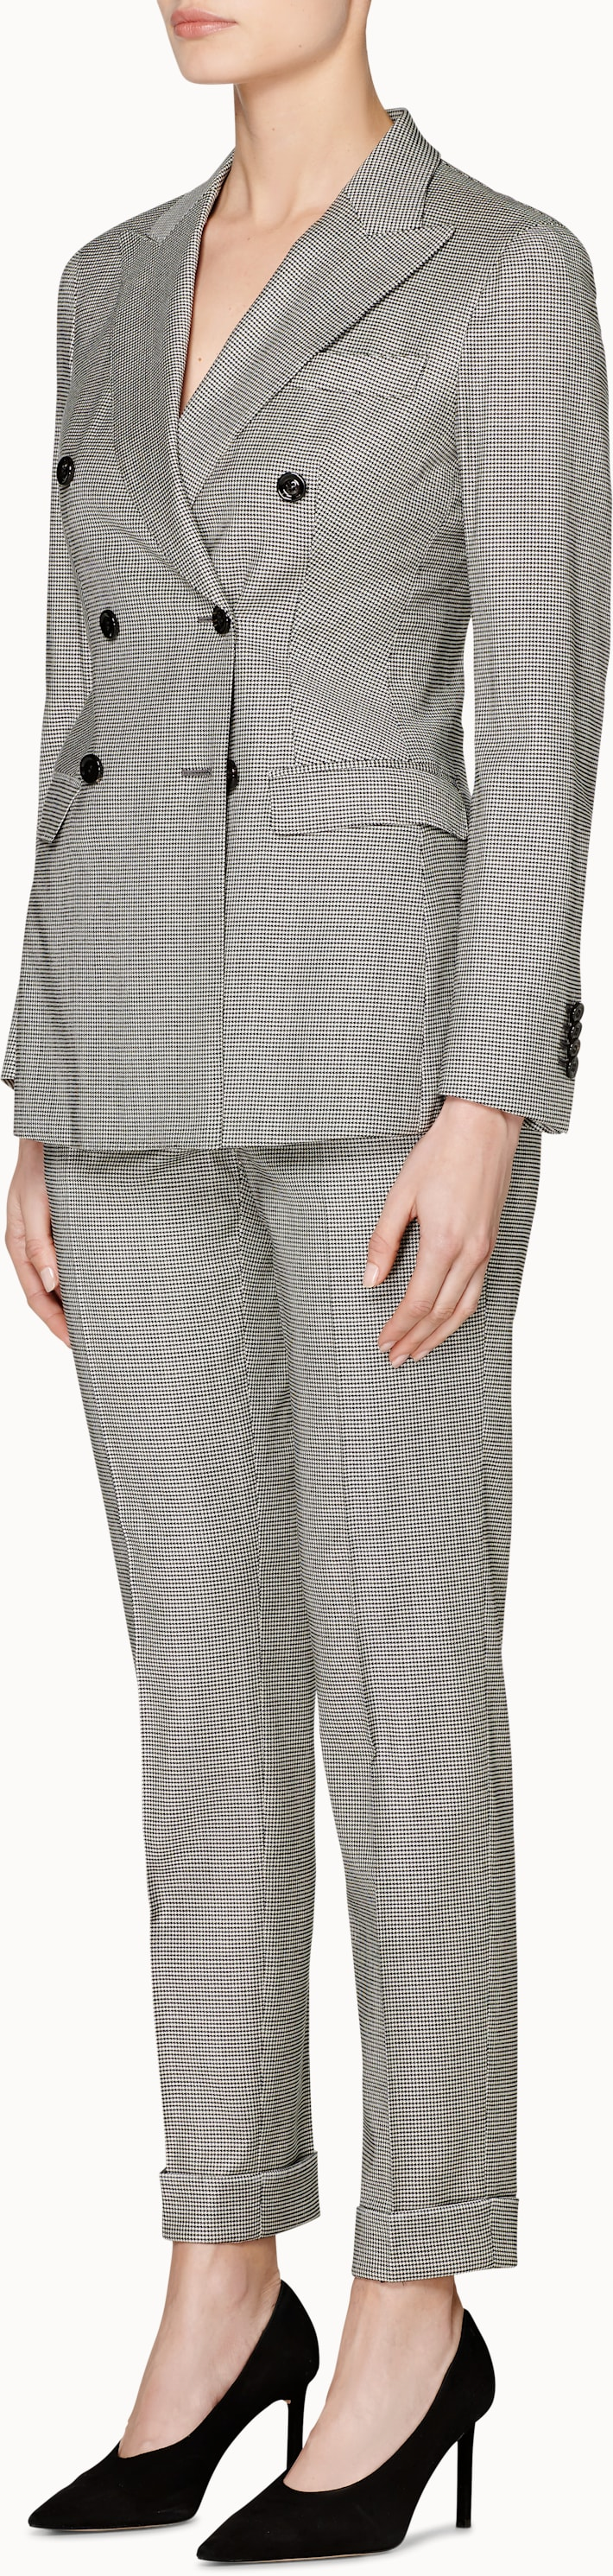 Cameron Grey Houndstooth Suit